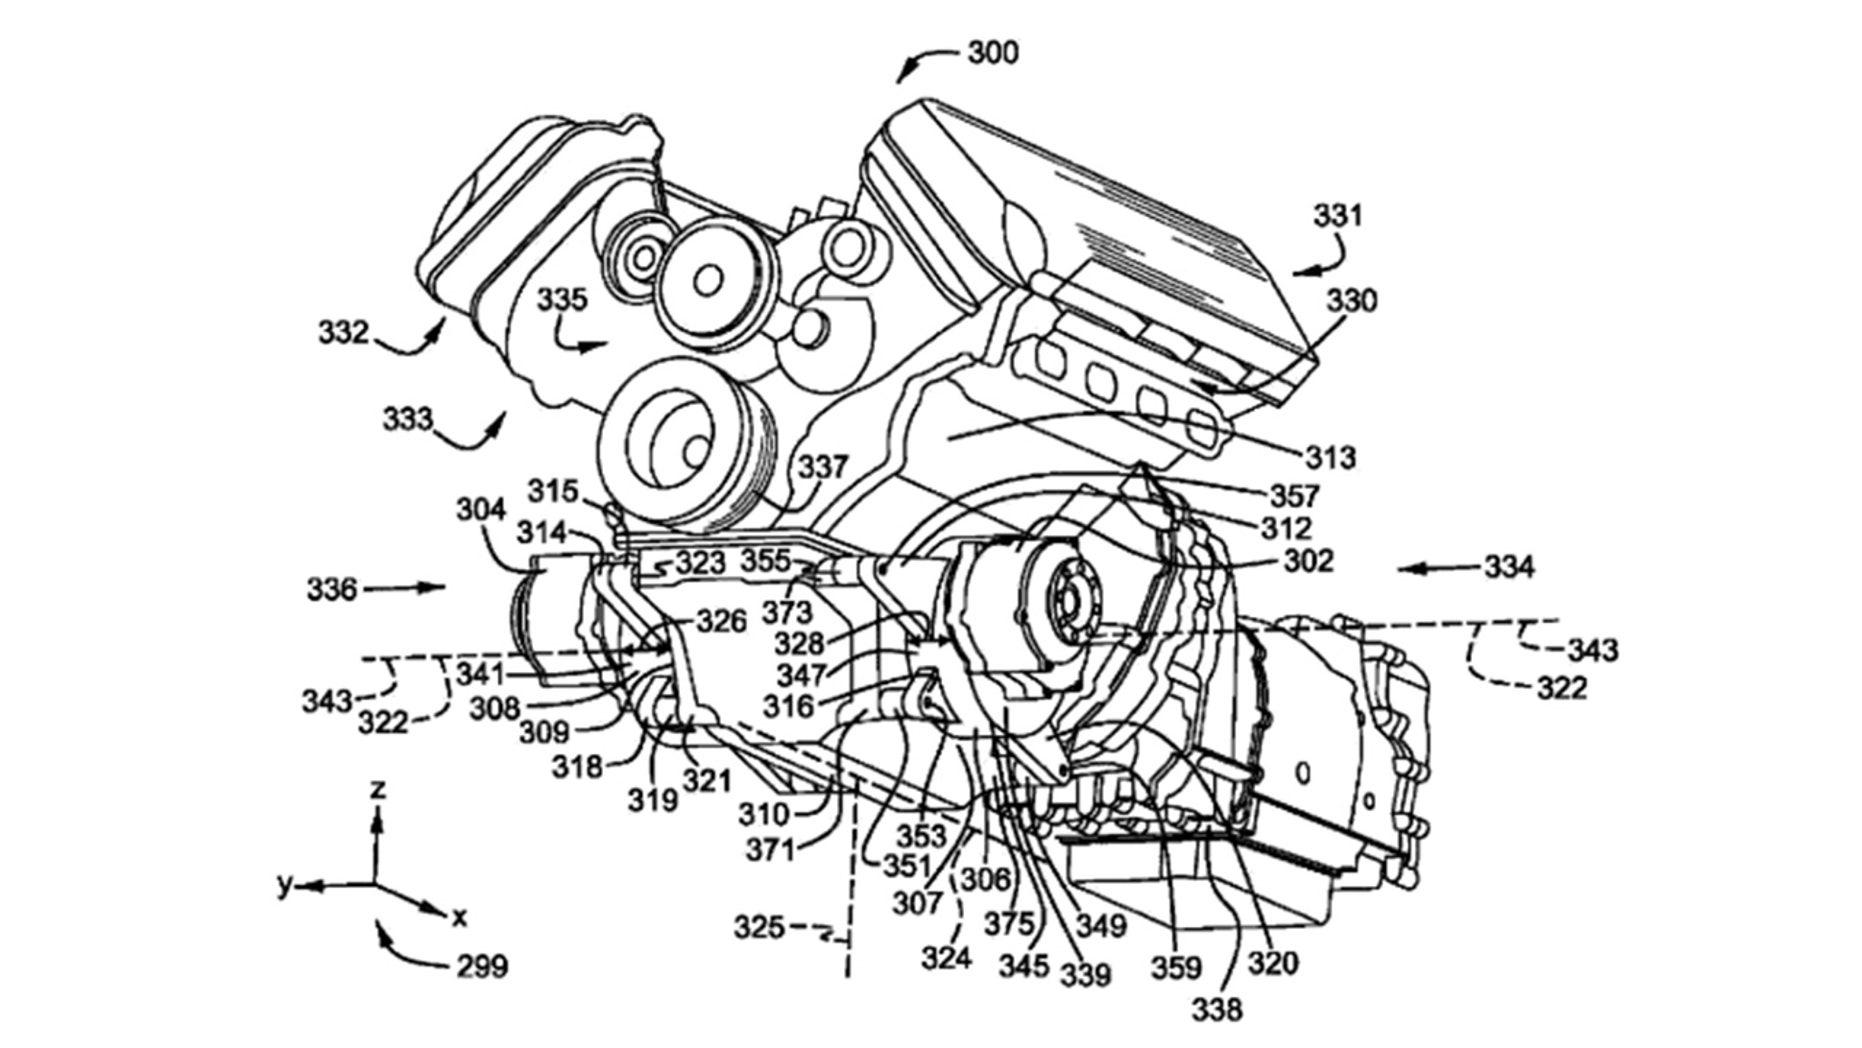 Unique all-wheel-drive hybrid V8 powertrain revealed in ...